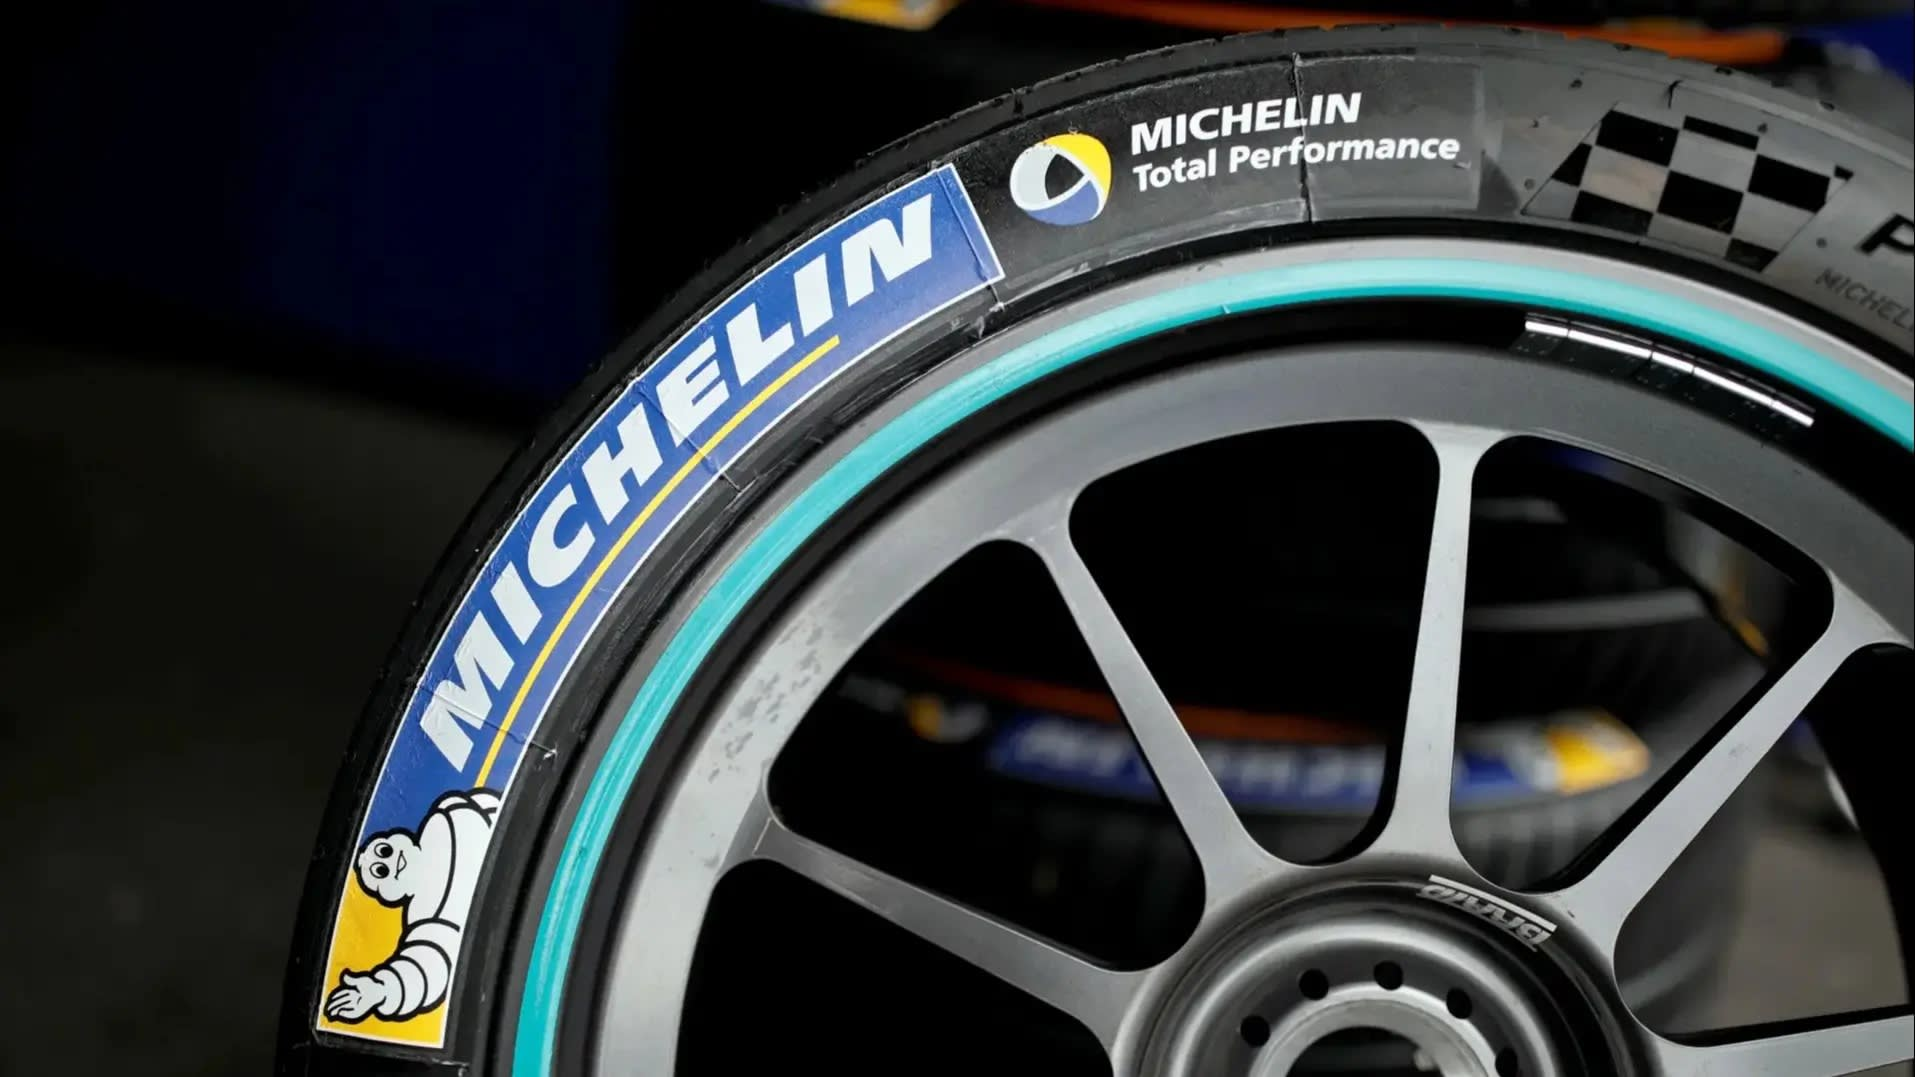 Michelin Acquires 88 Percent Stake in PT Multistada Arah Sarana TBK